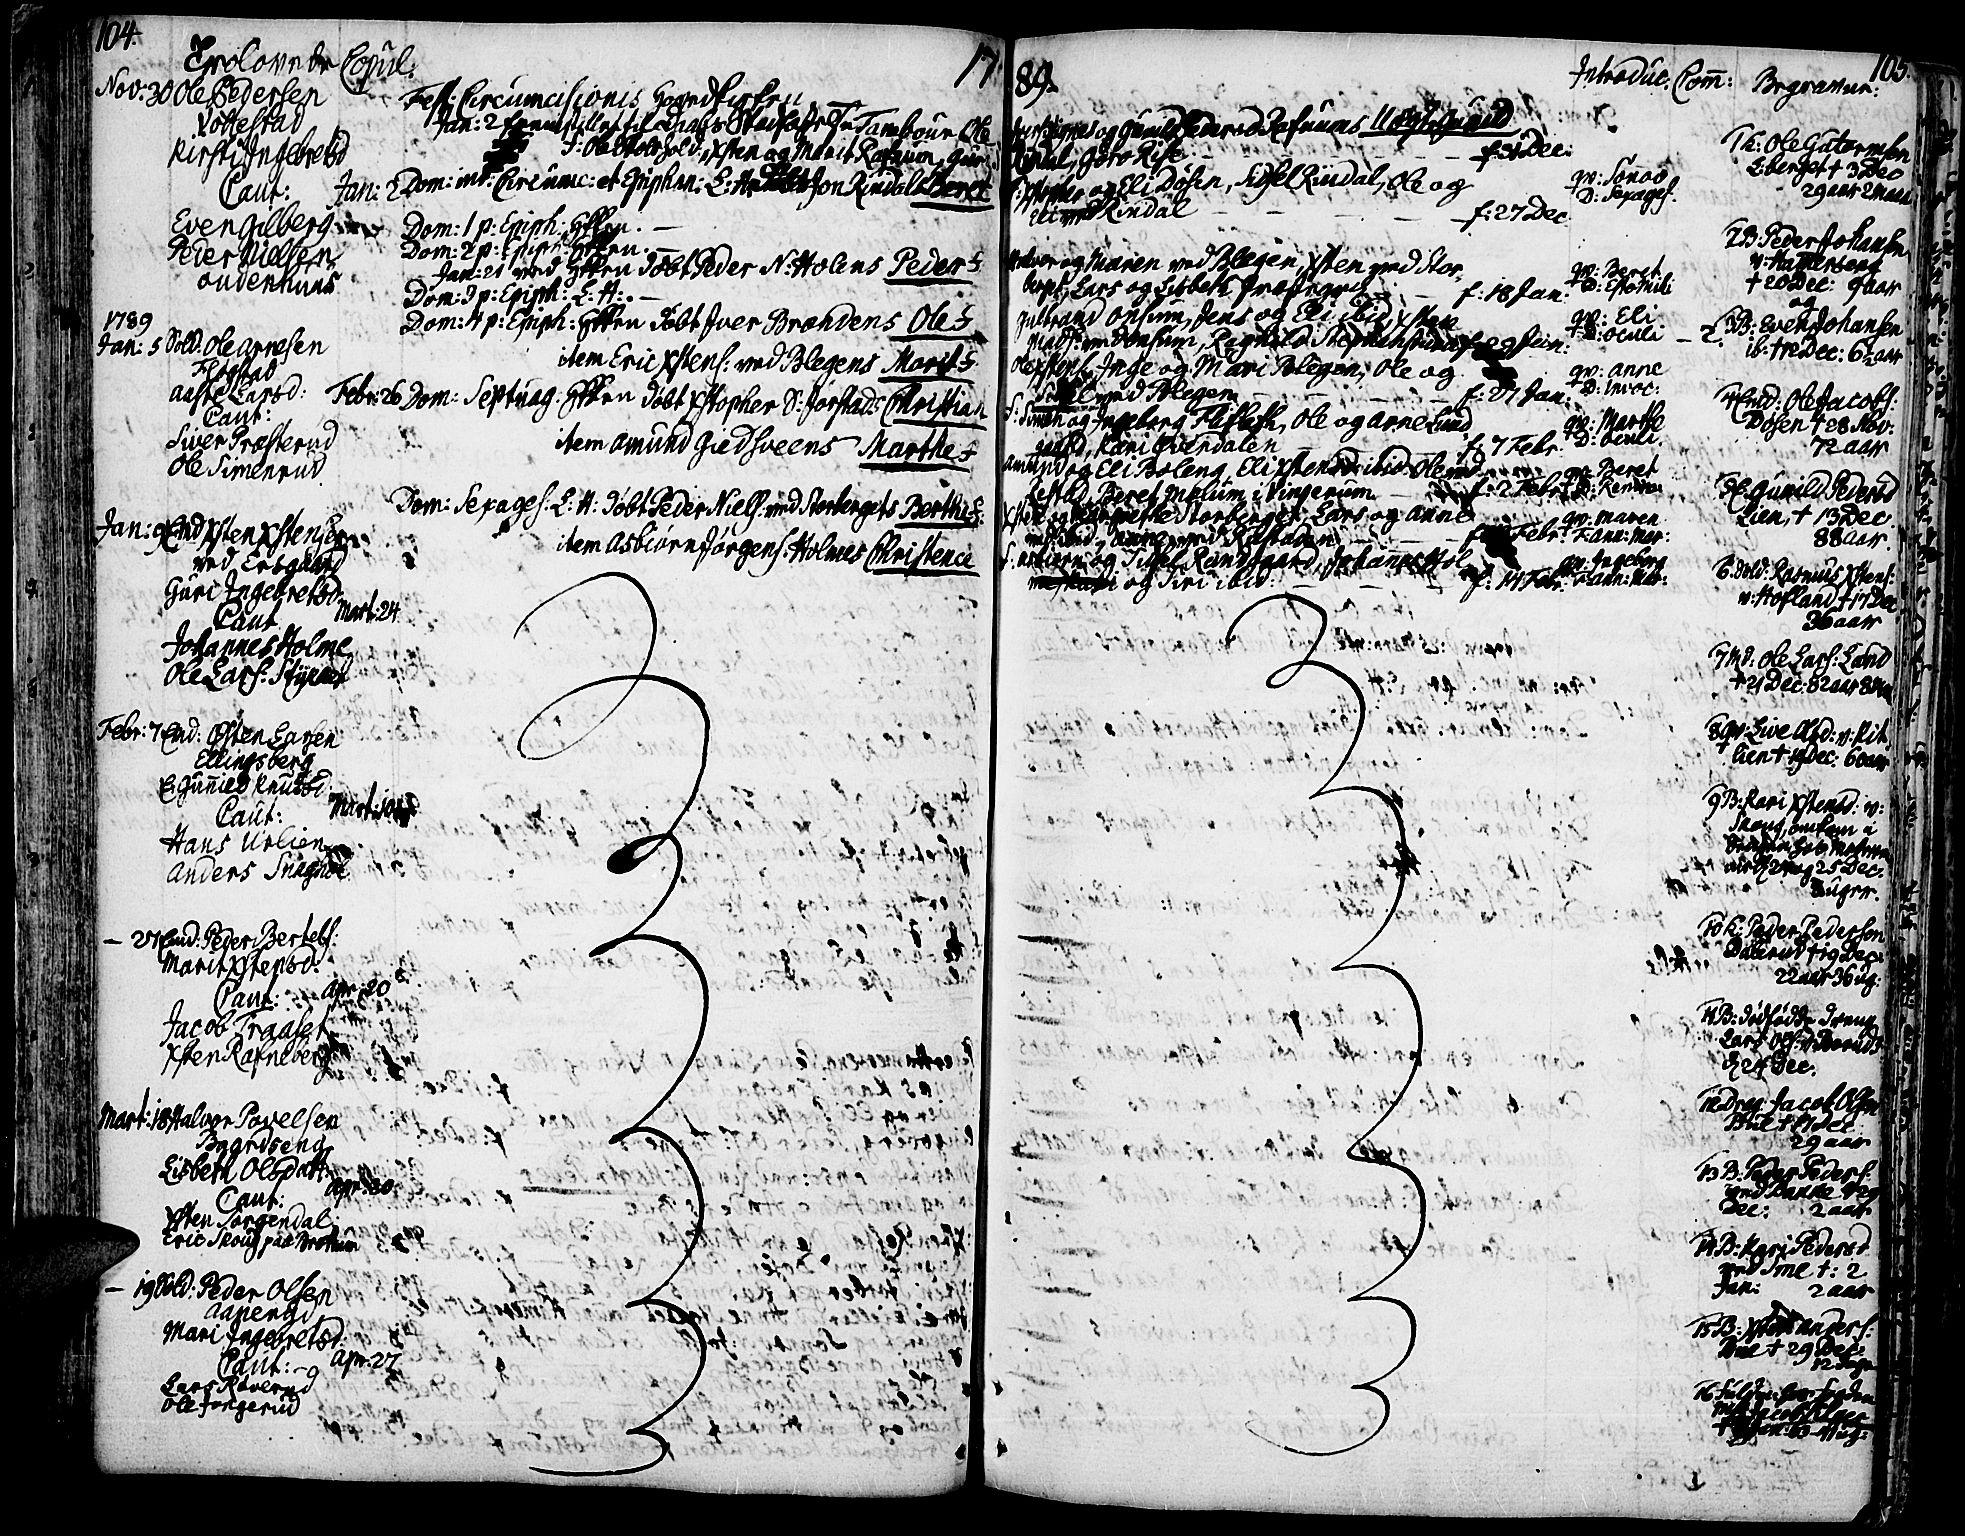 SAH, Fåberg prestekontor, Ministerialbok nr. 2, 1775-1818, s. 104-105